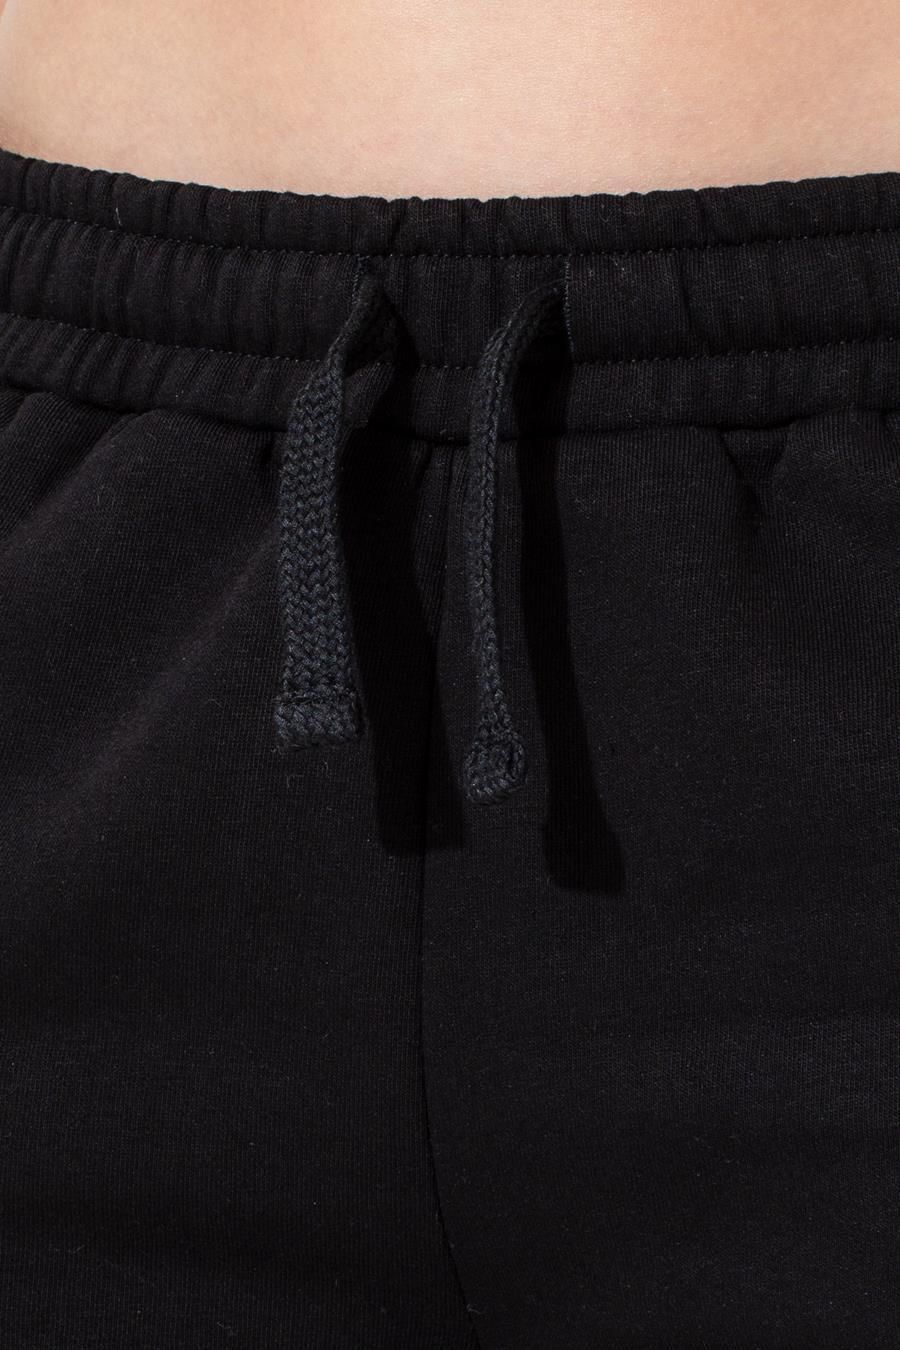 Hype Black Crest Kids Shorts